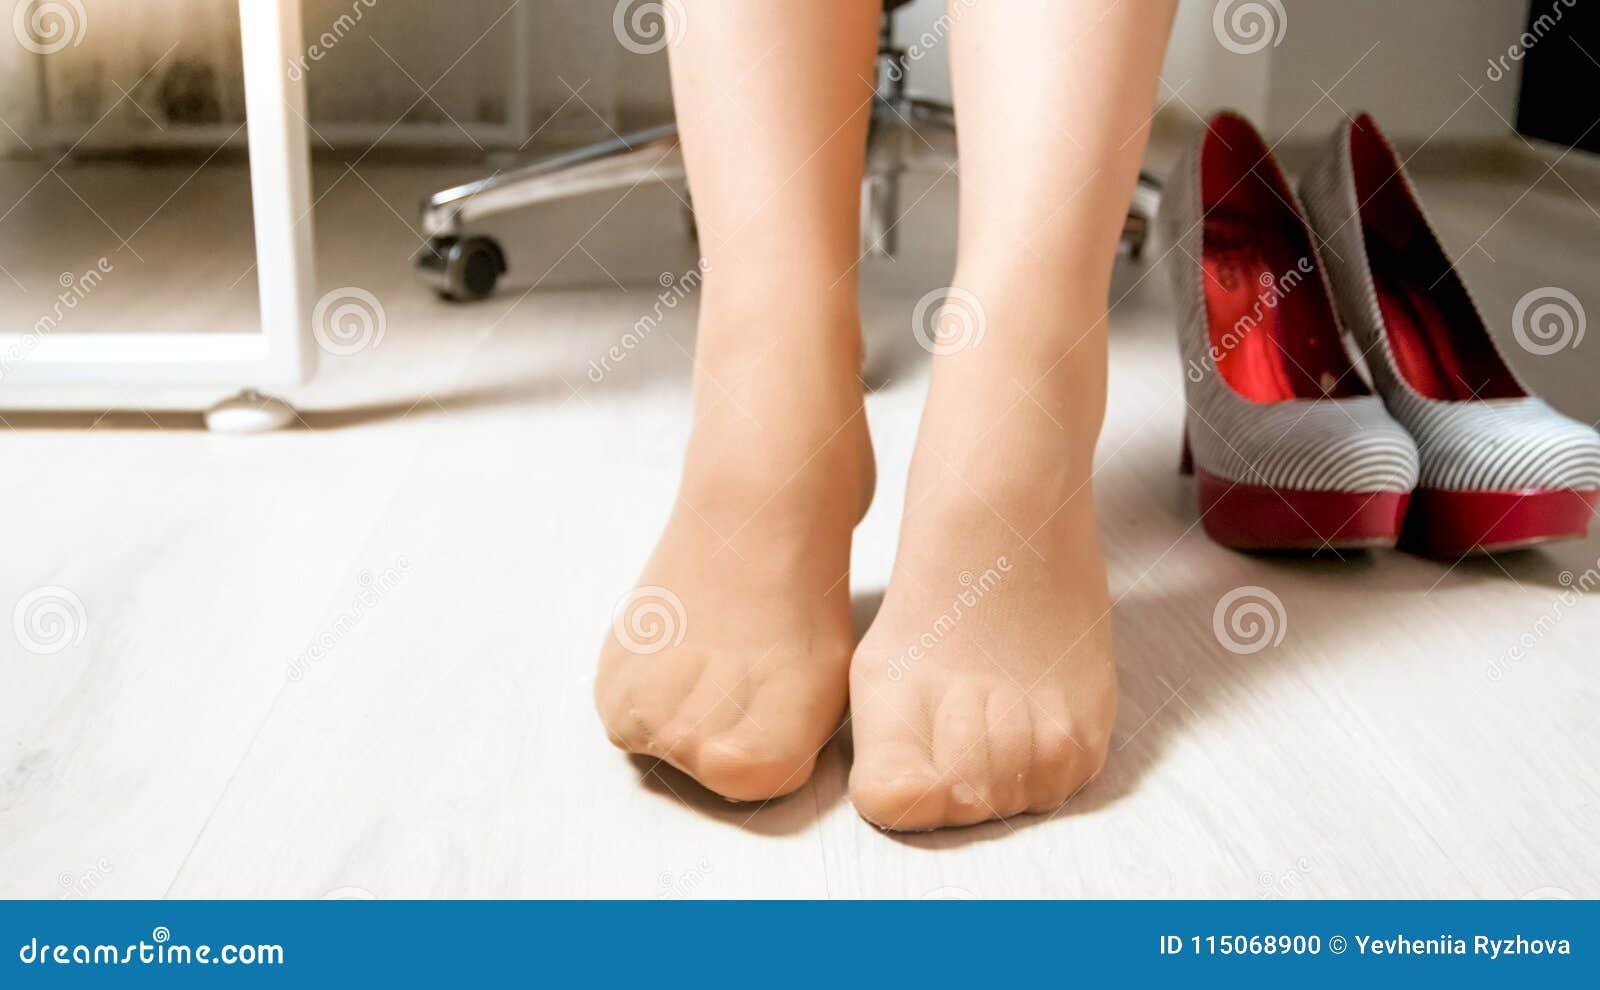 wearing pantyhose sexy legs